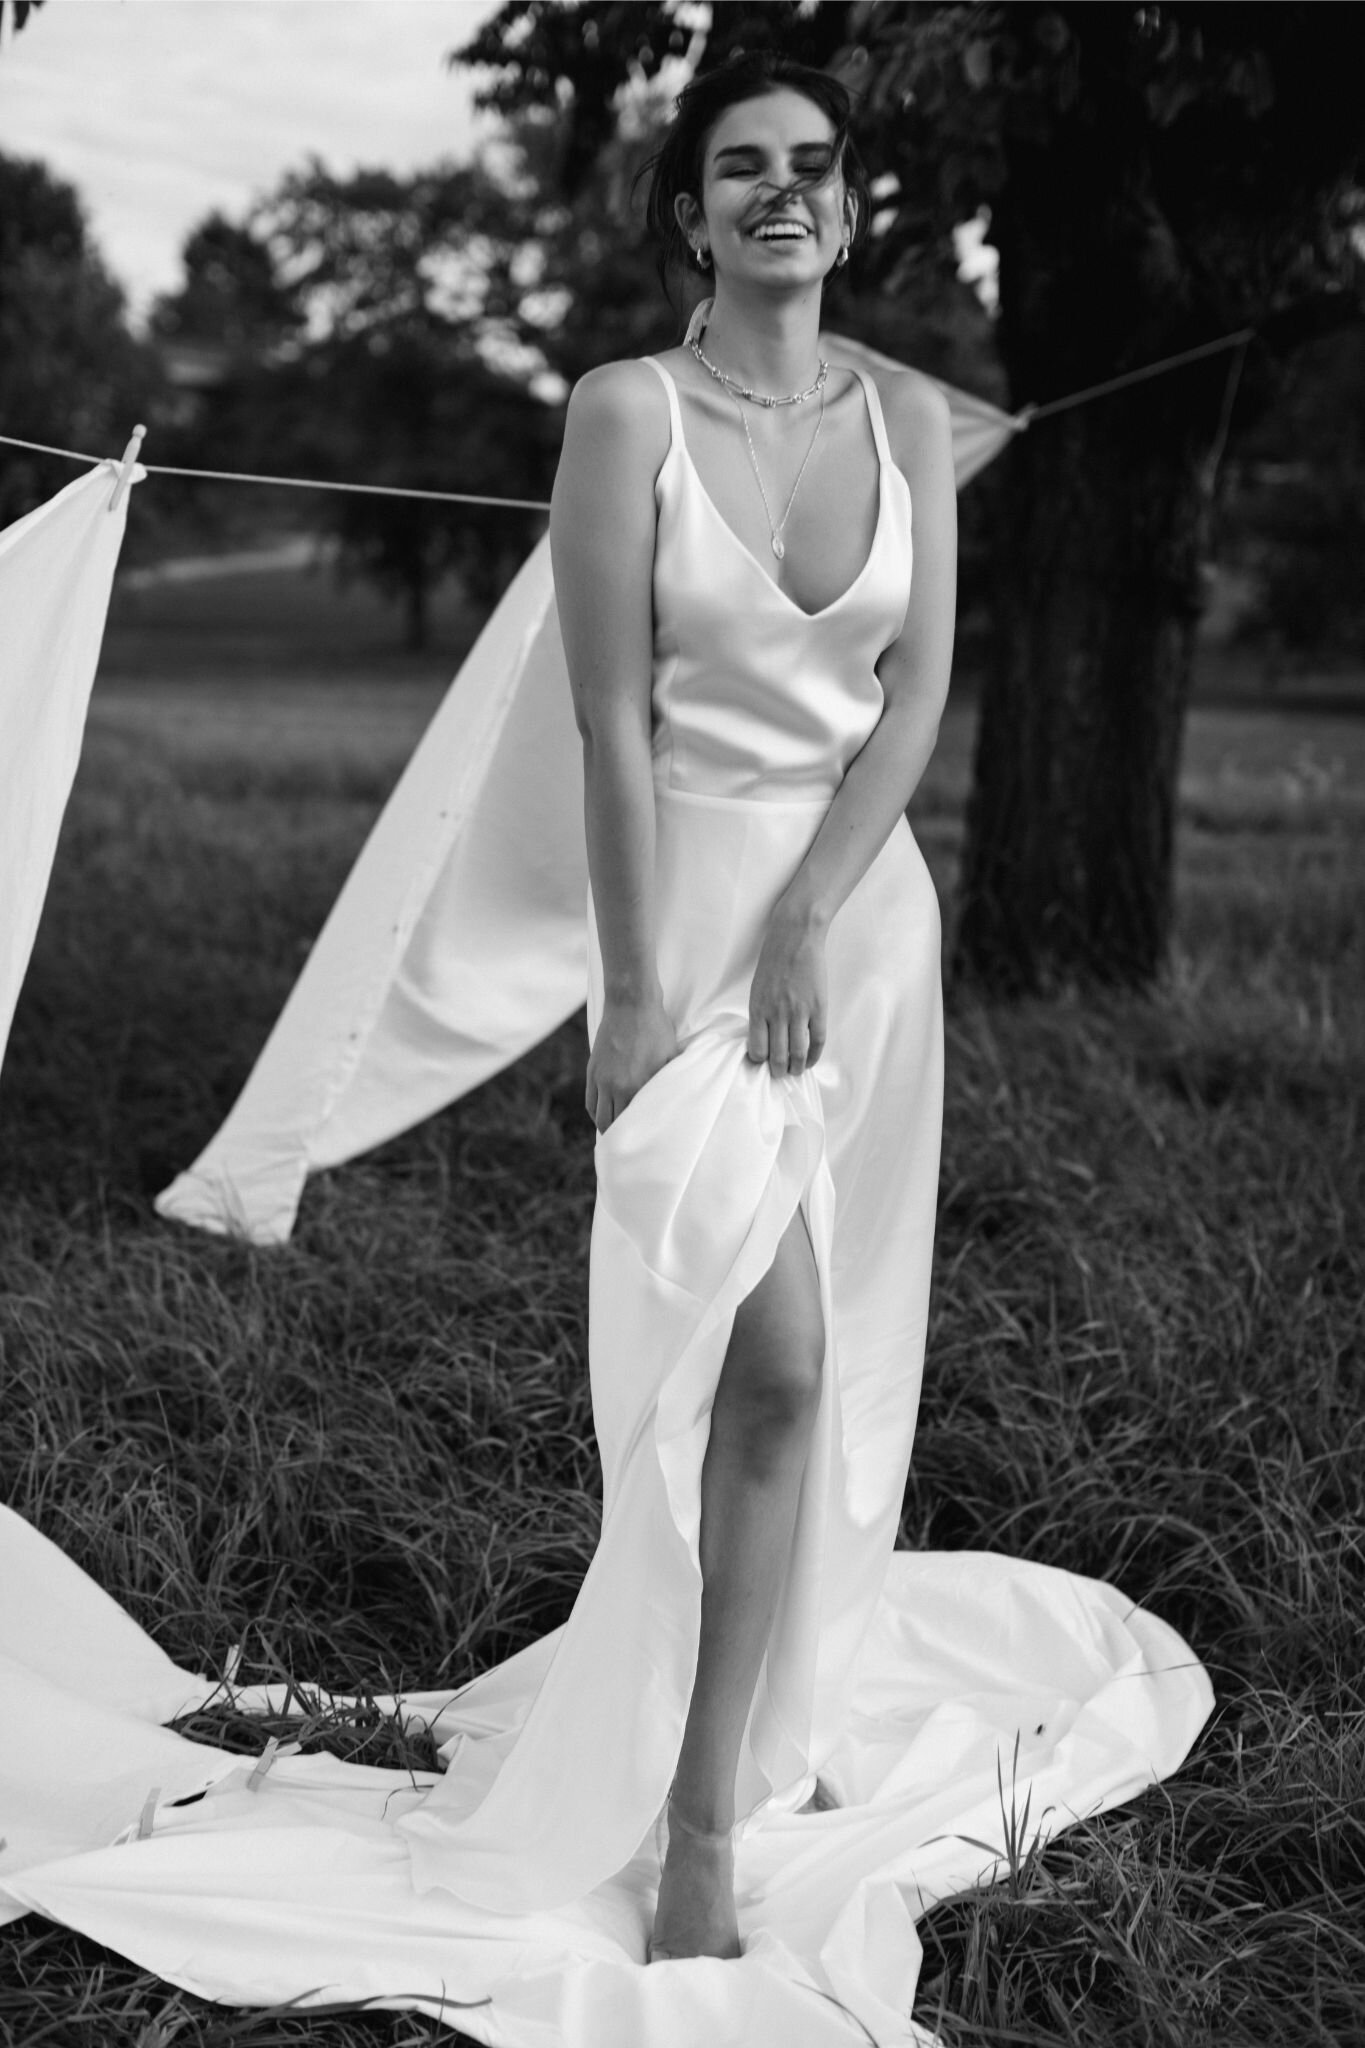 the-saums-bebas-closet-summer-bride-fashion-editorial-25.jpg